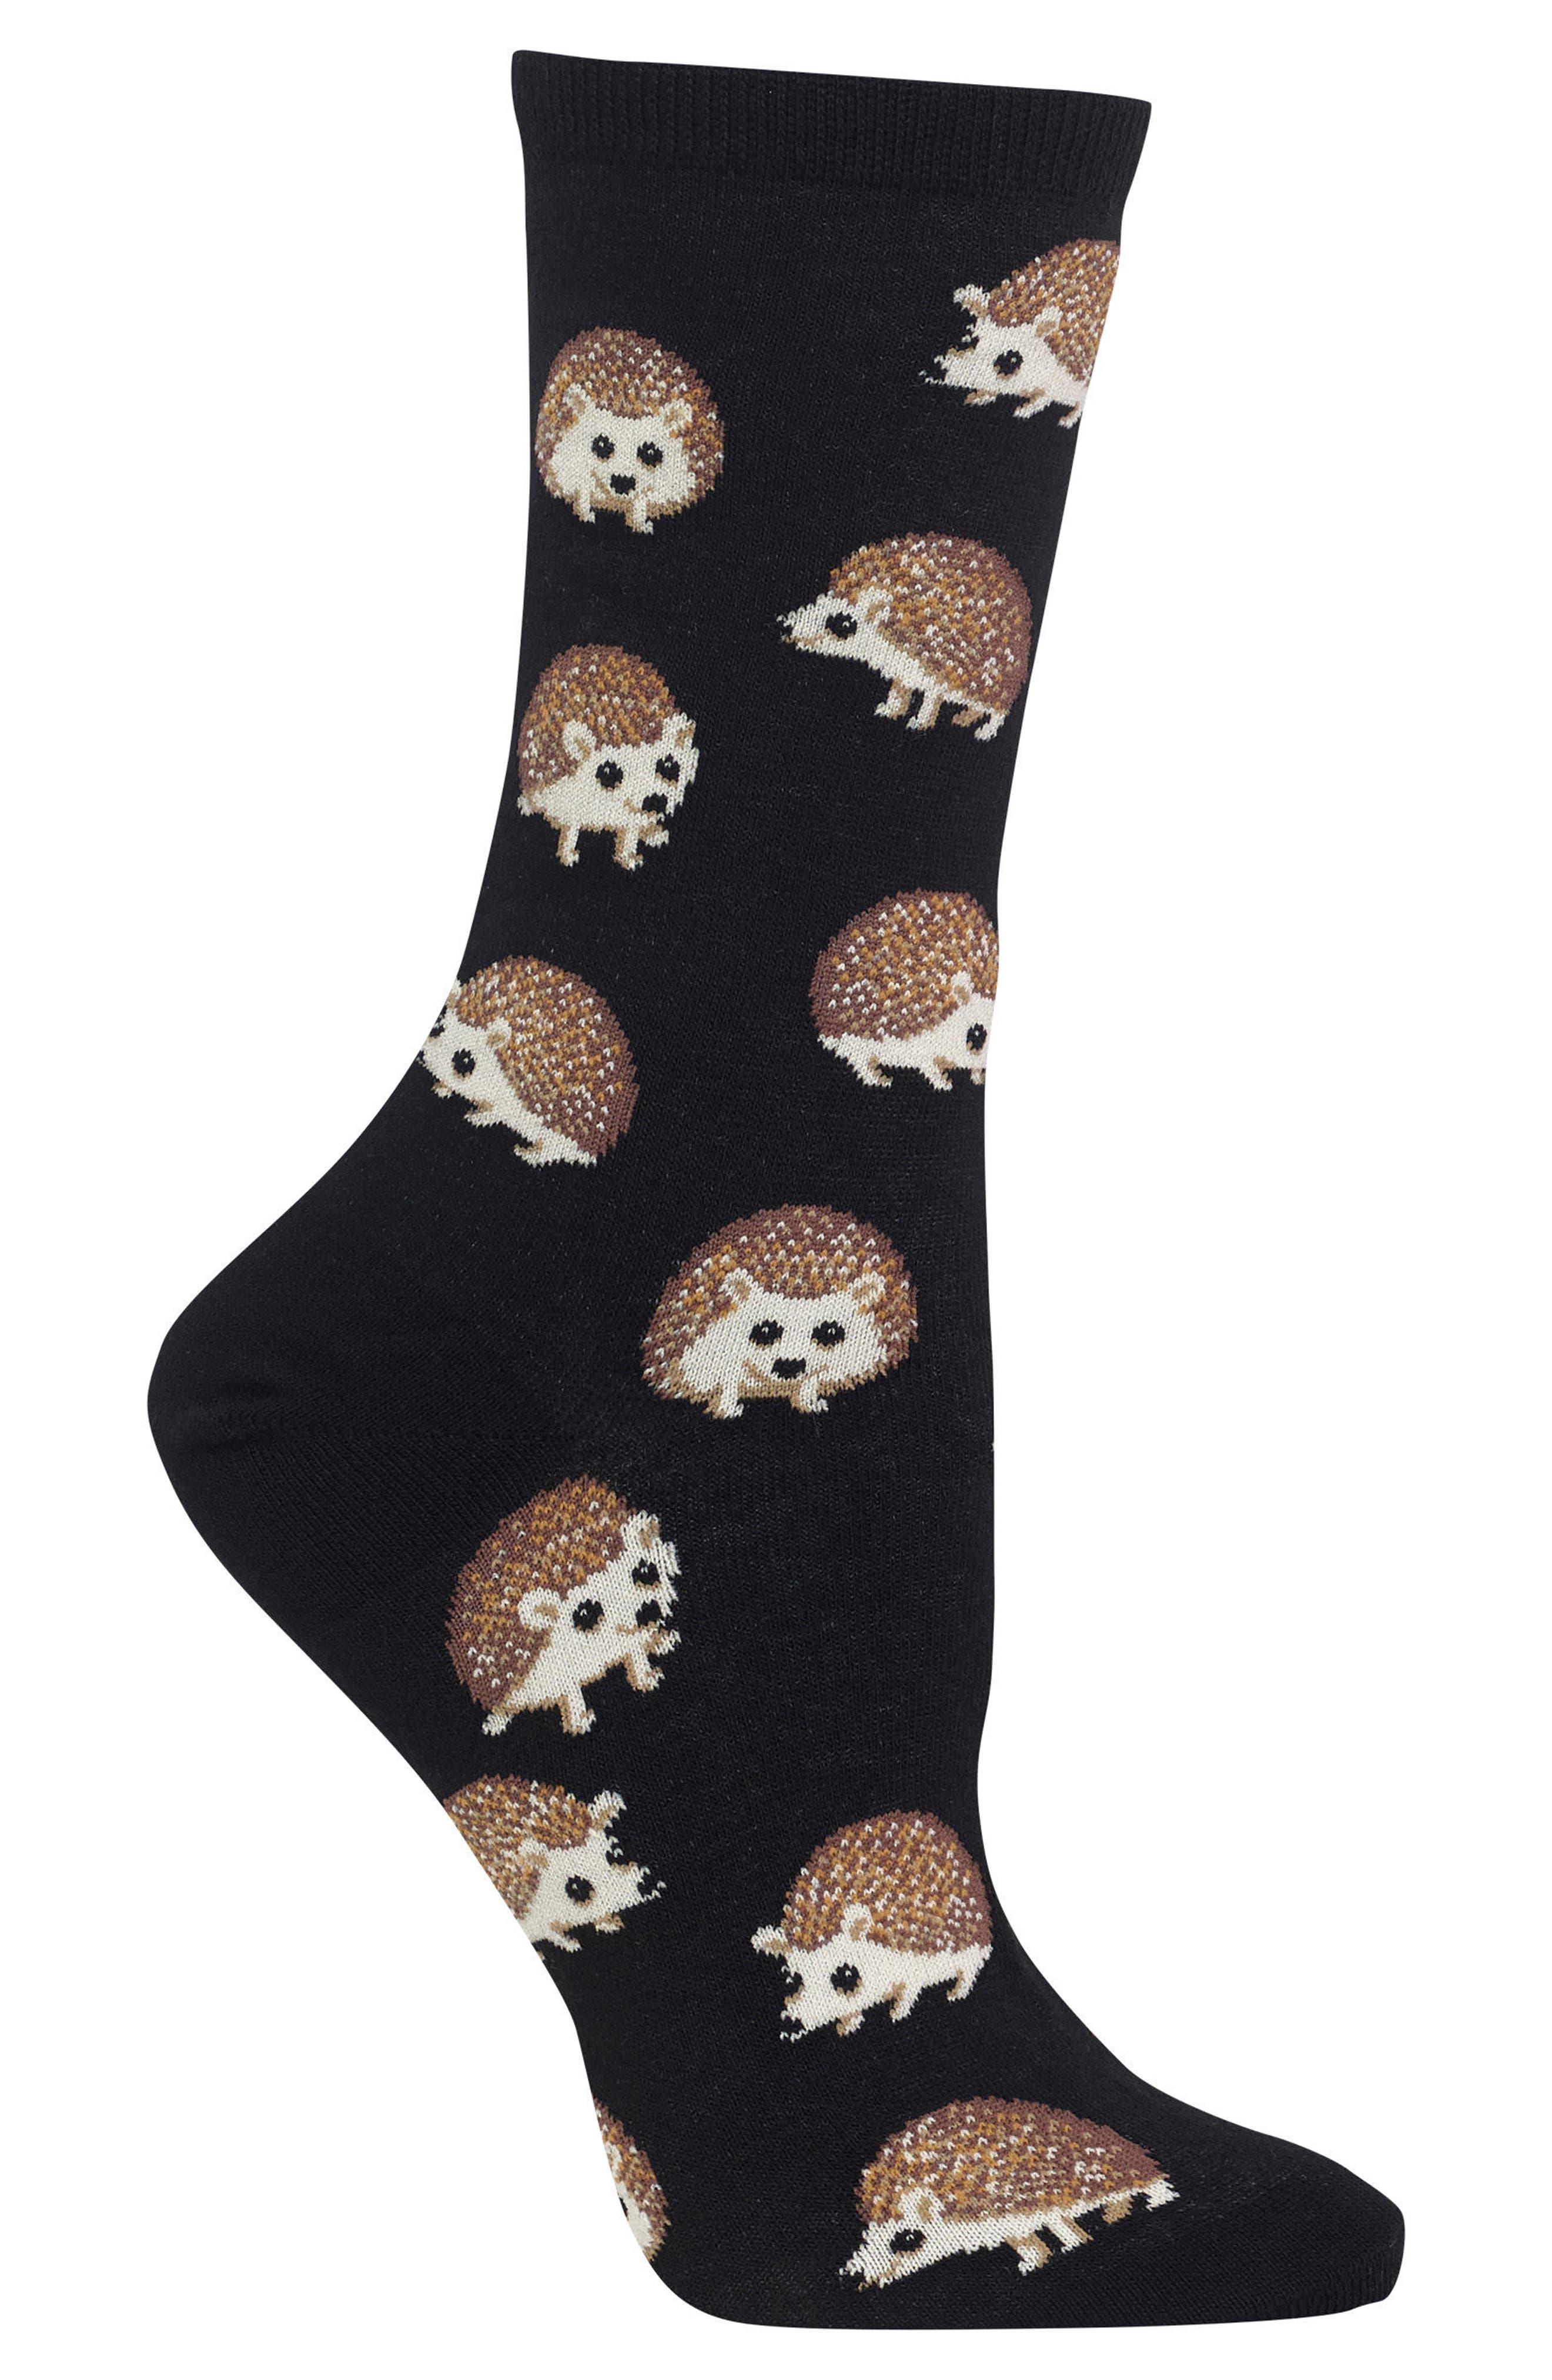 Hedgehog Crew Socks,                             Alternate thumbnail 2, color,                             001